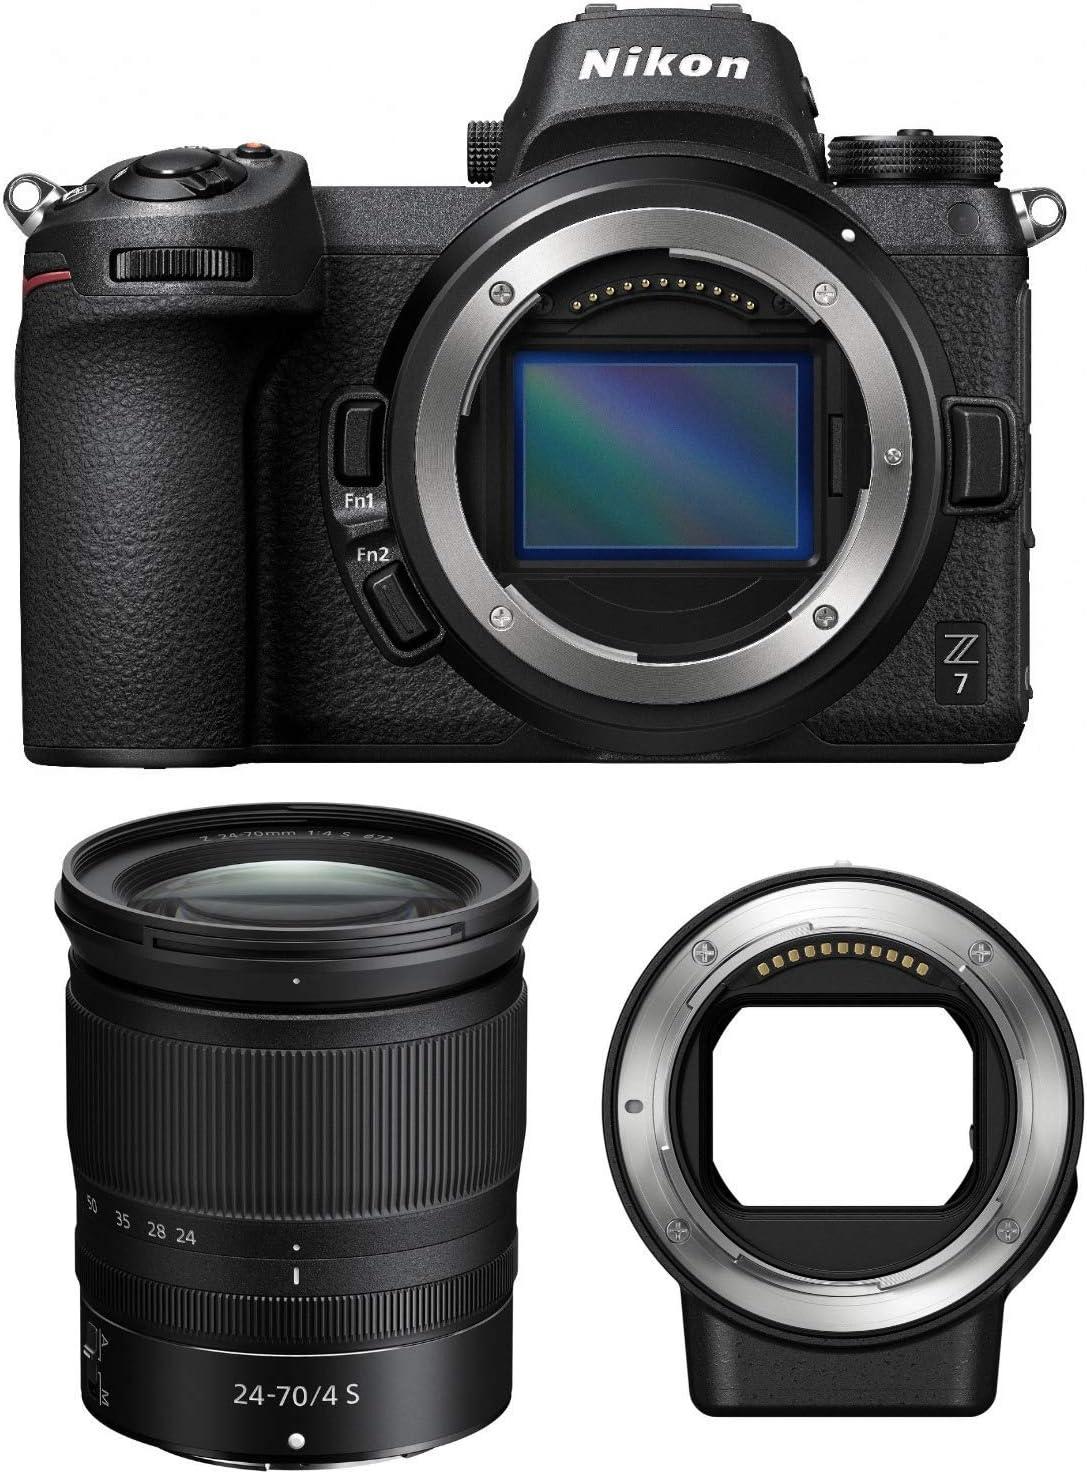 Nikon Z7 Dedication Mirrorless Digital Sales results No. 1 Camera F 24-70mm Lens with and